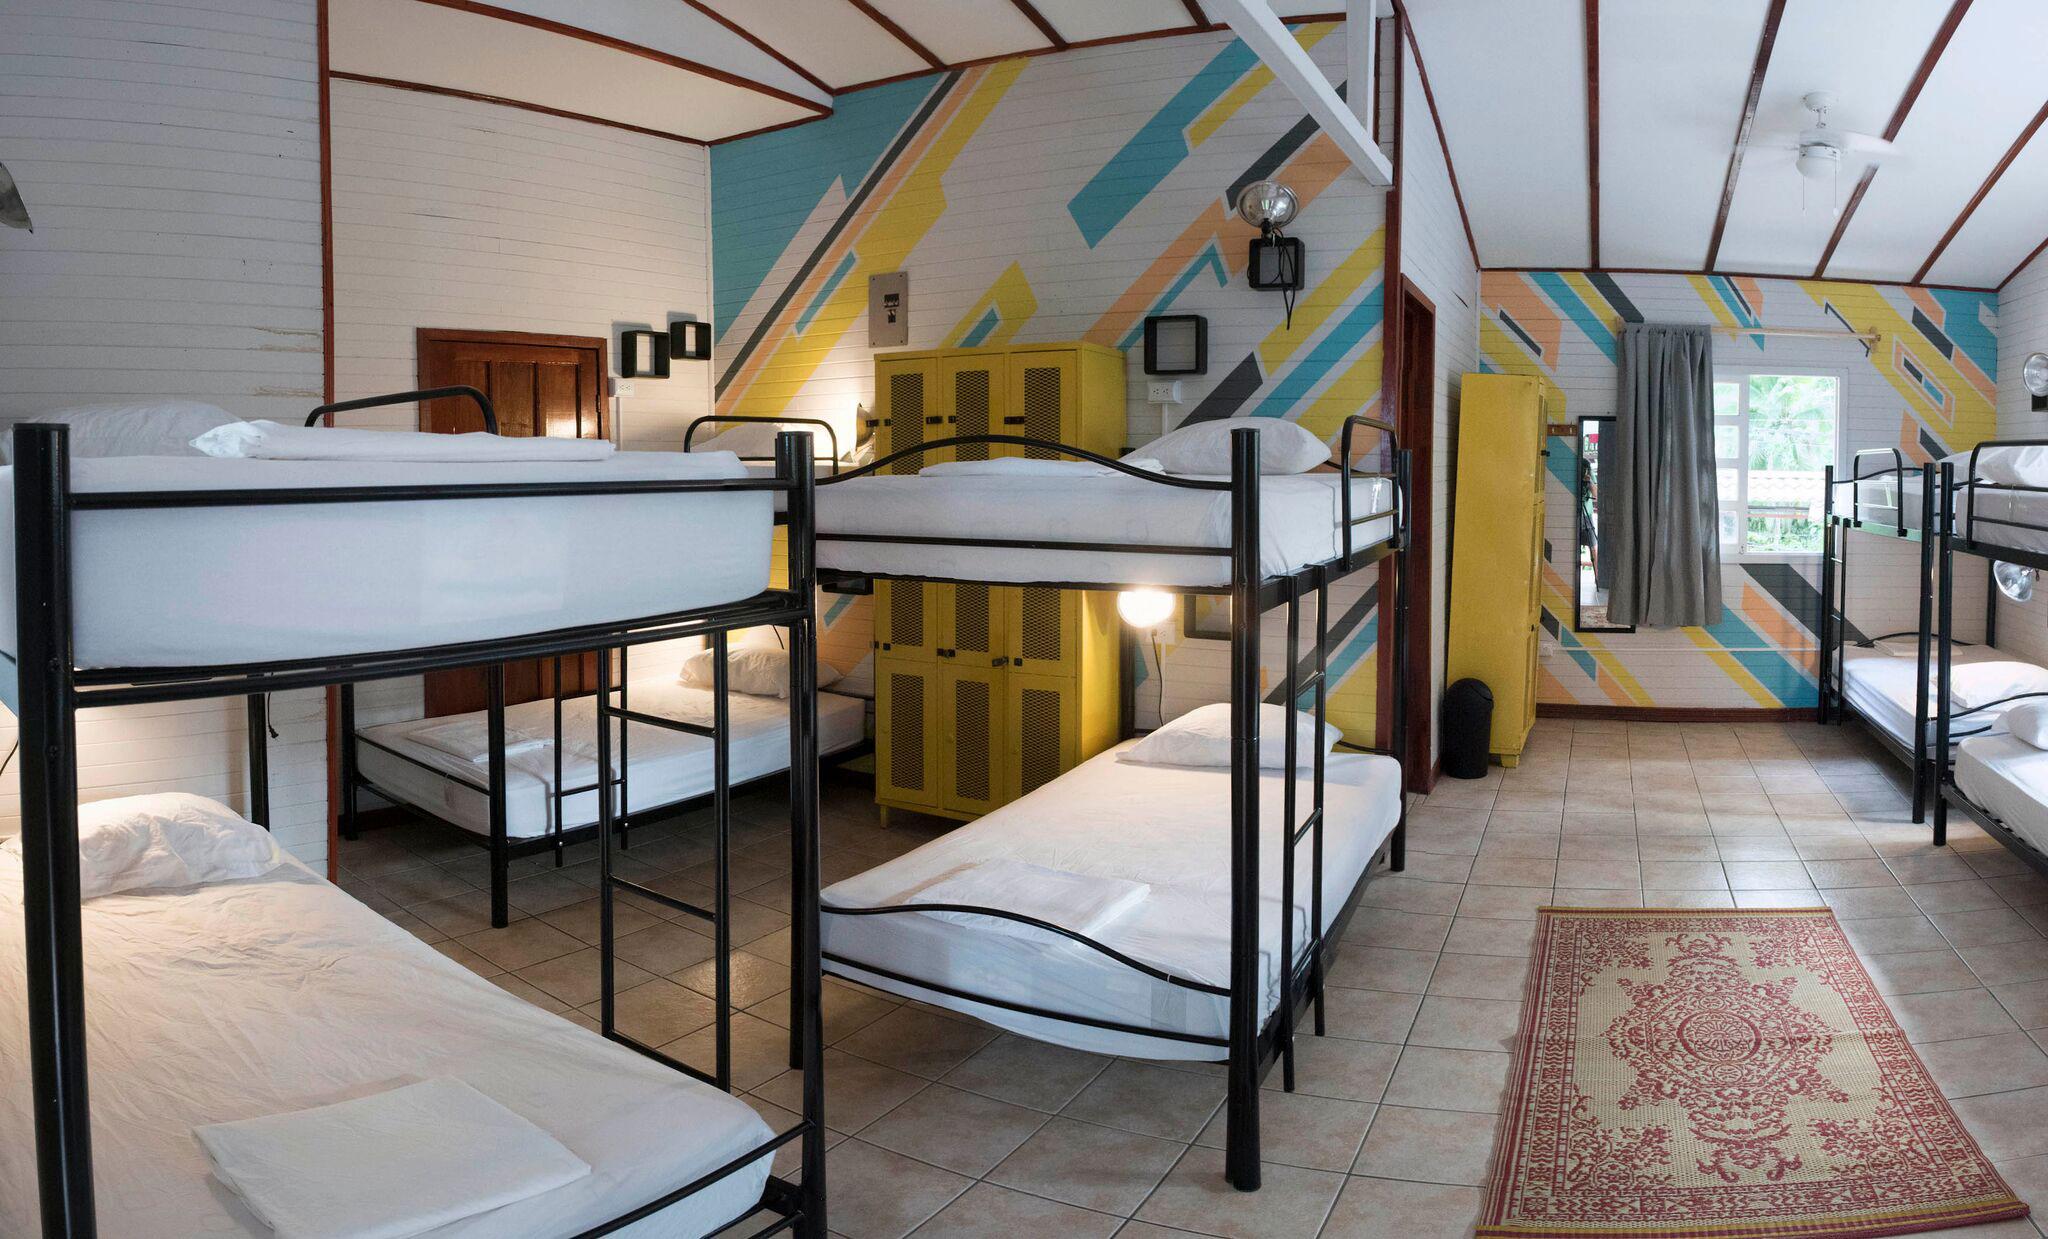 12-Bed-Dorm_001_preview.jpg